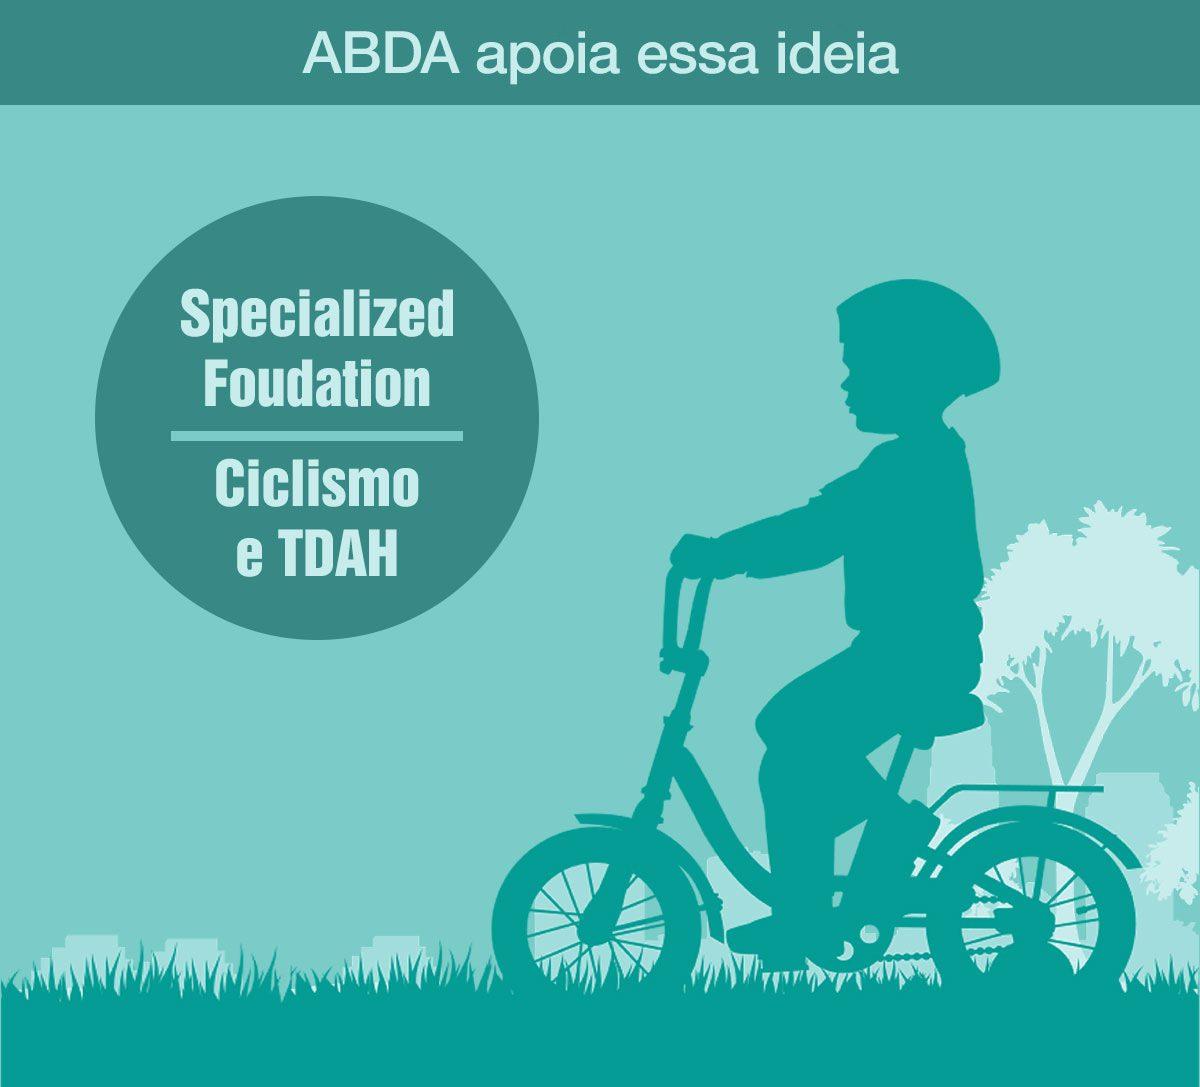 specialized e TDAH site